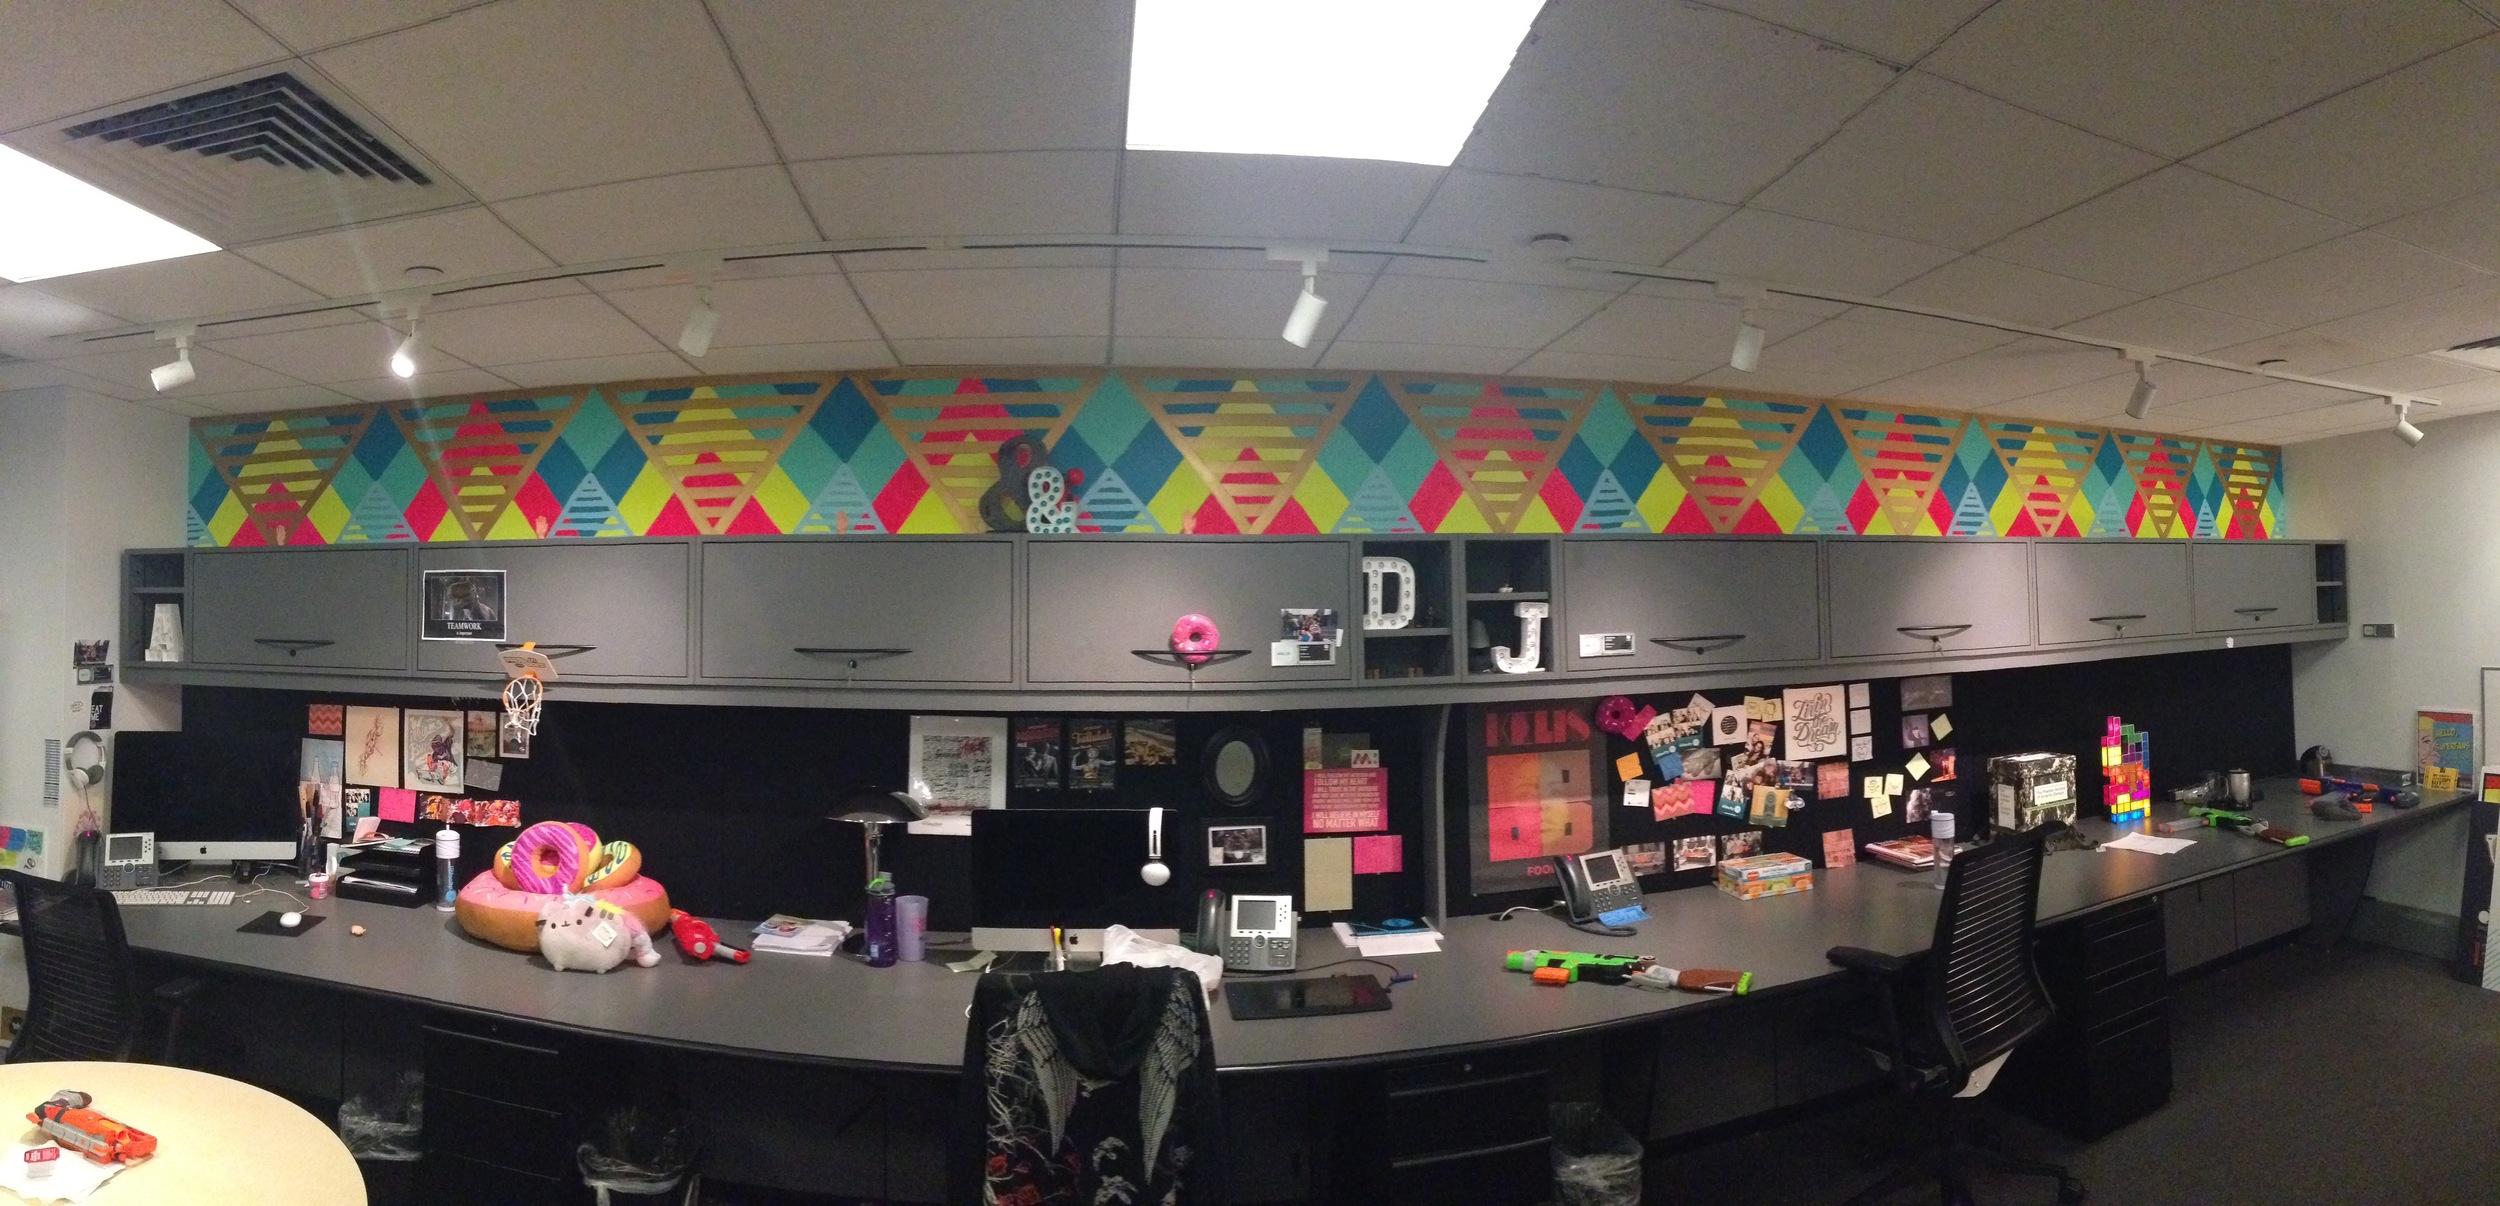 Viacom Velocity Creative Office 2015